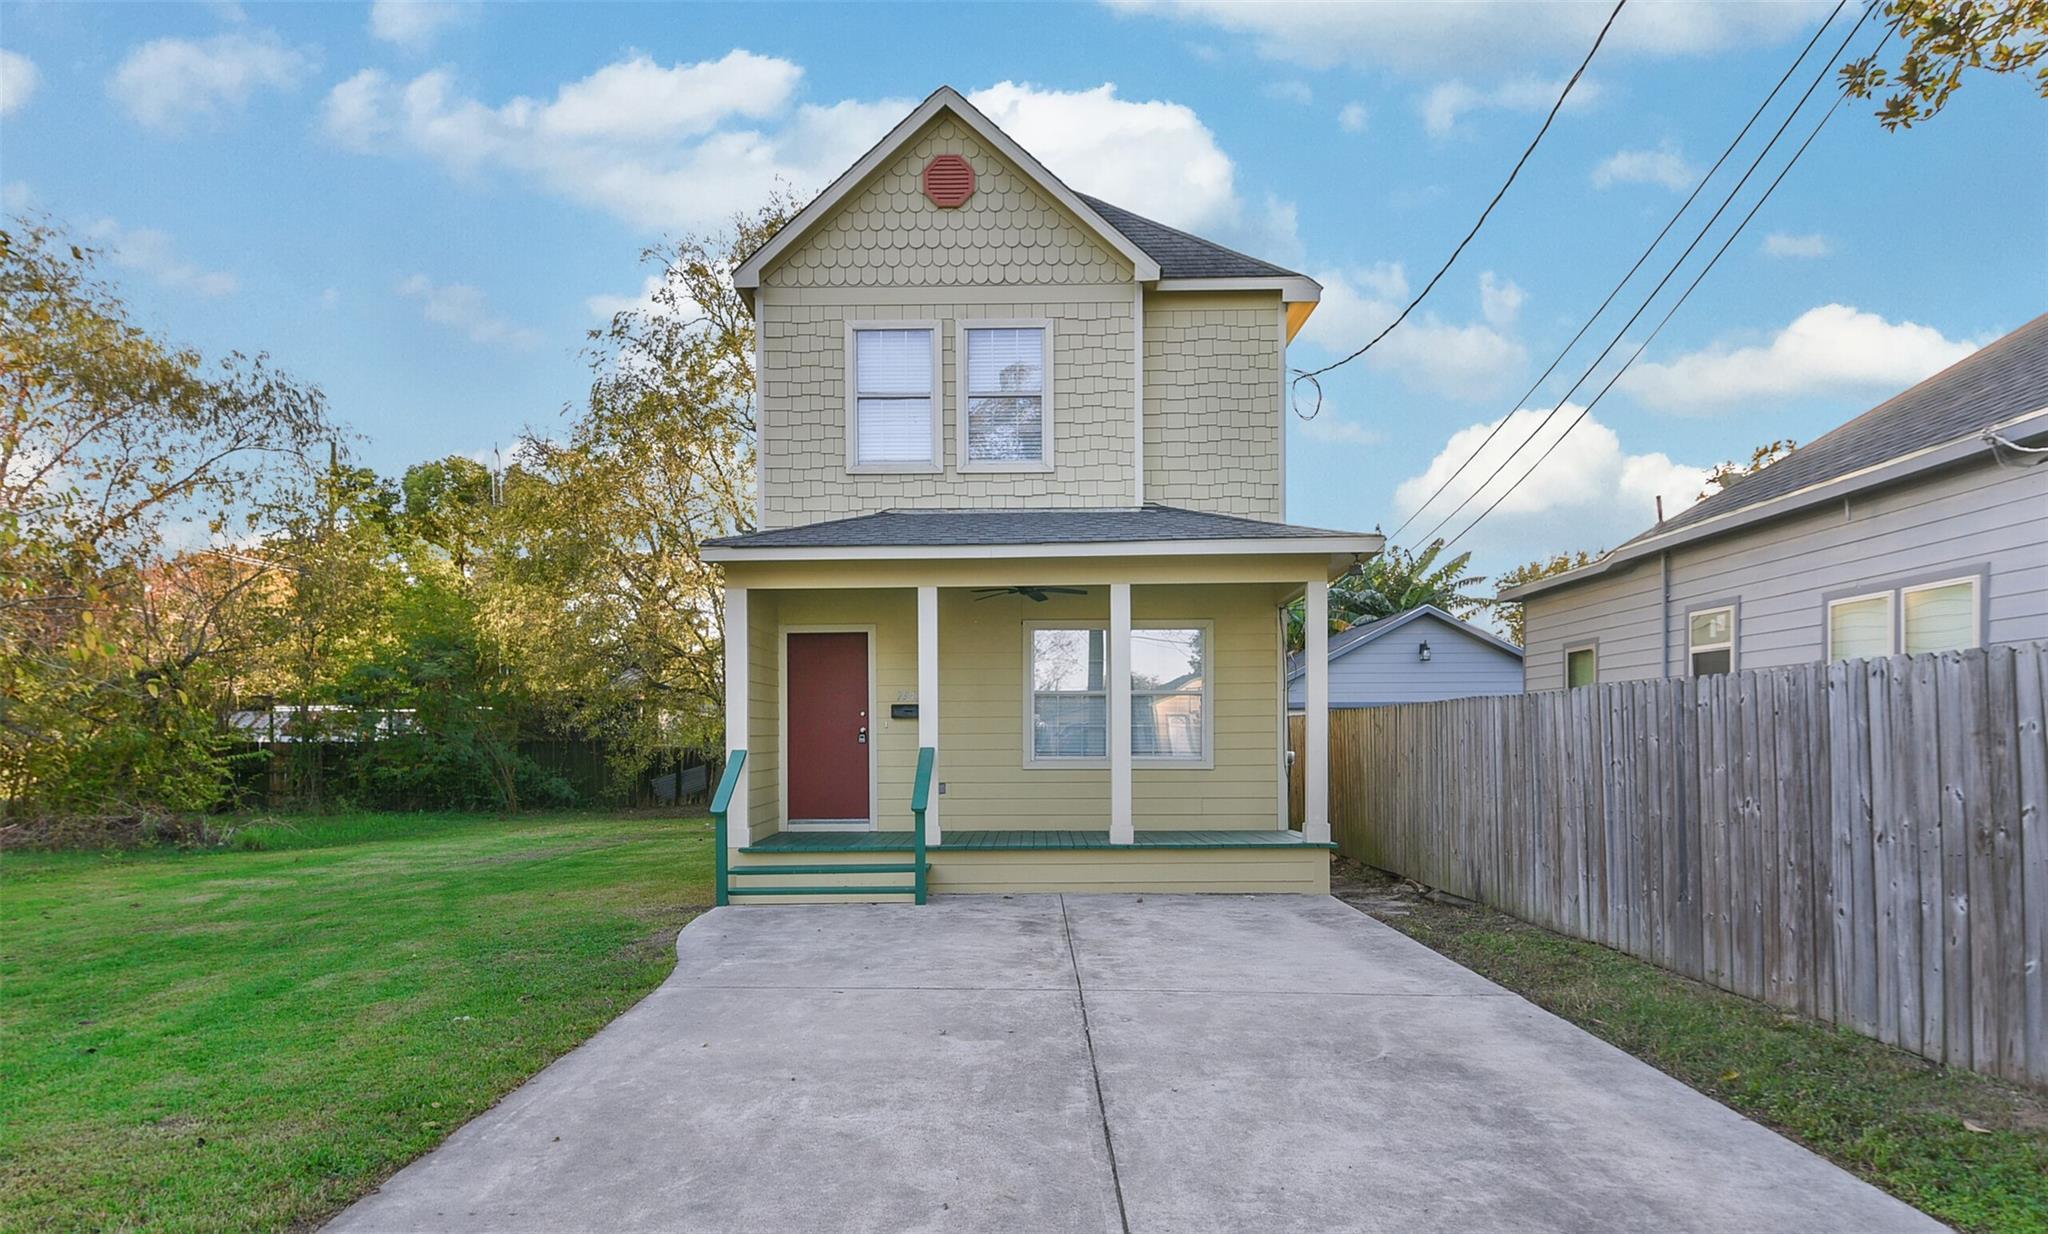 7942 Avenue F Property Photo - Houston, TX real estate listing